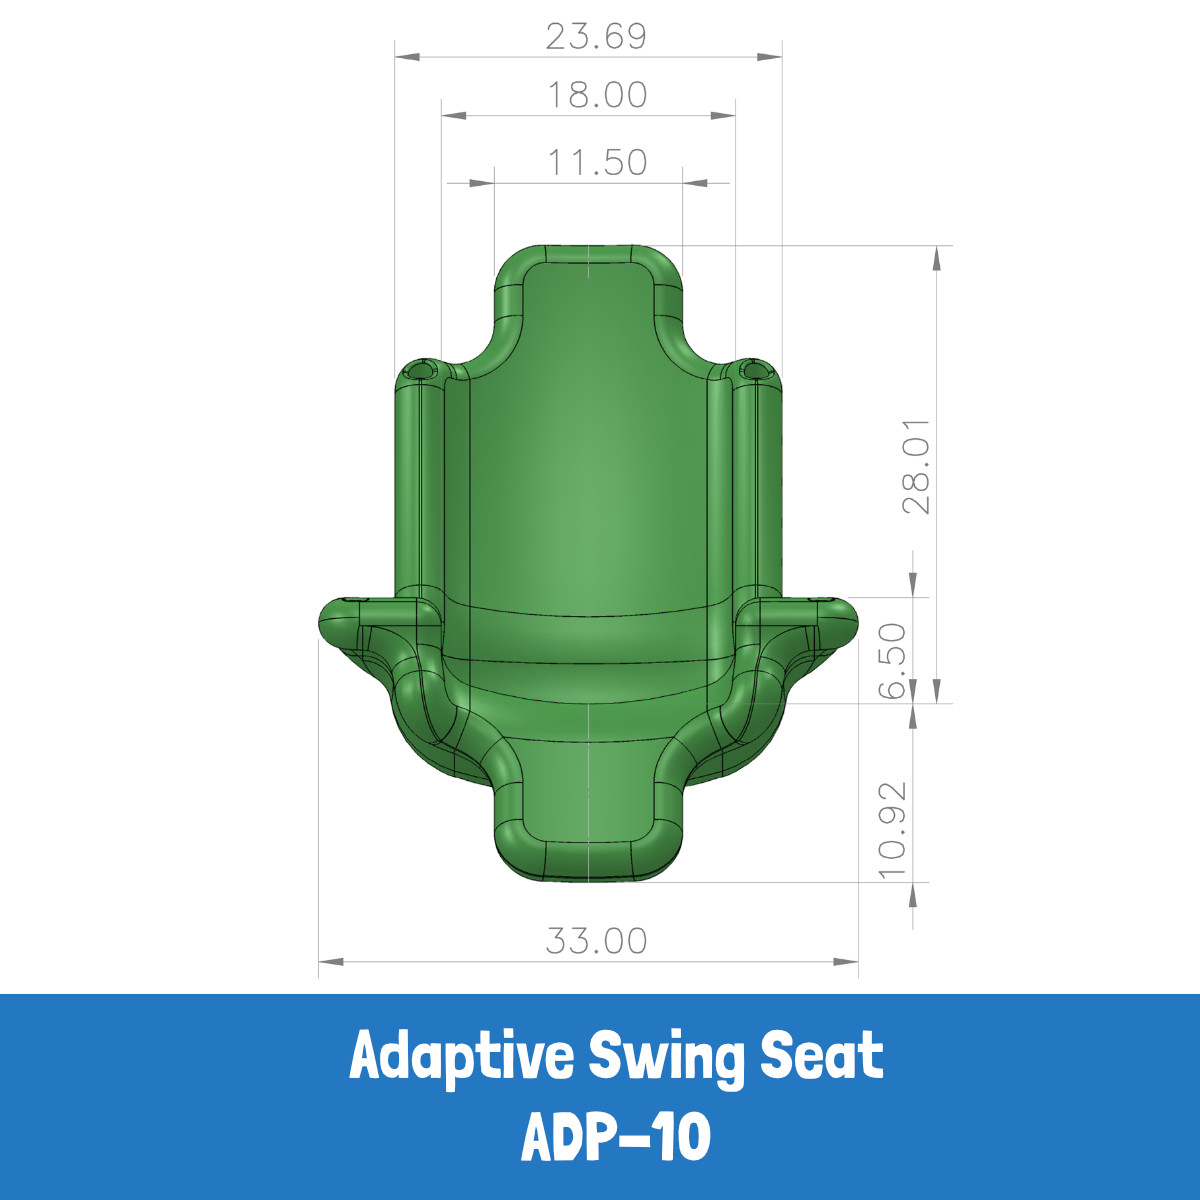 Adaptive Swing Seat (ADP-10) - Specs